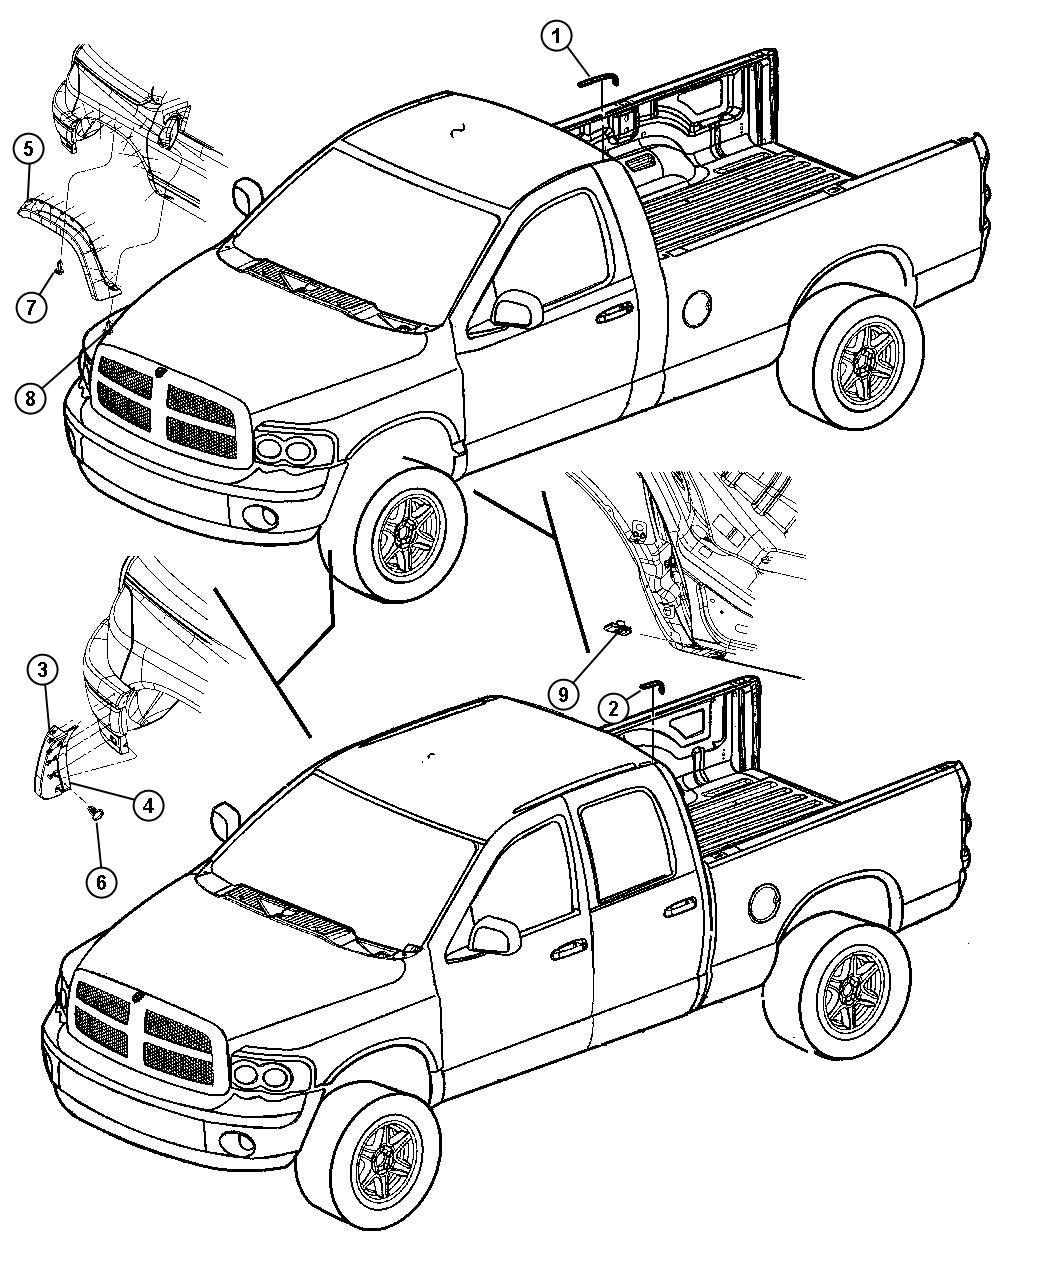 2008 Dodge Ram 4500 Molding. Wheel opening flare. Right